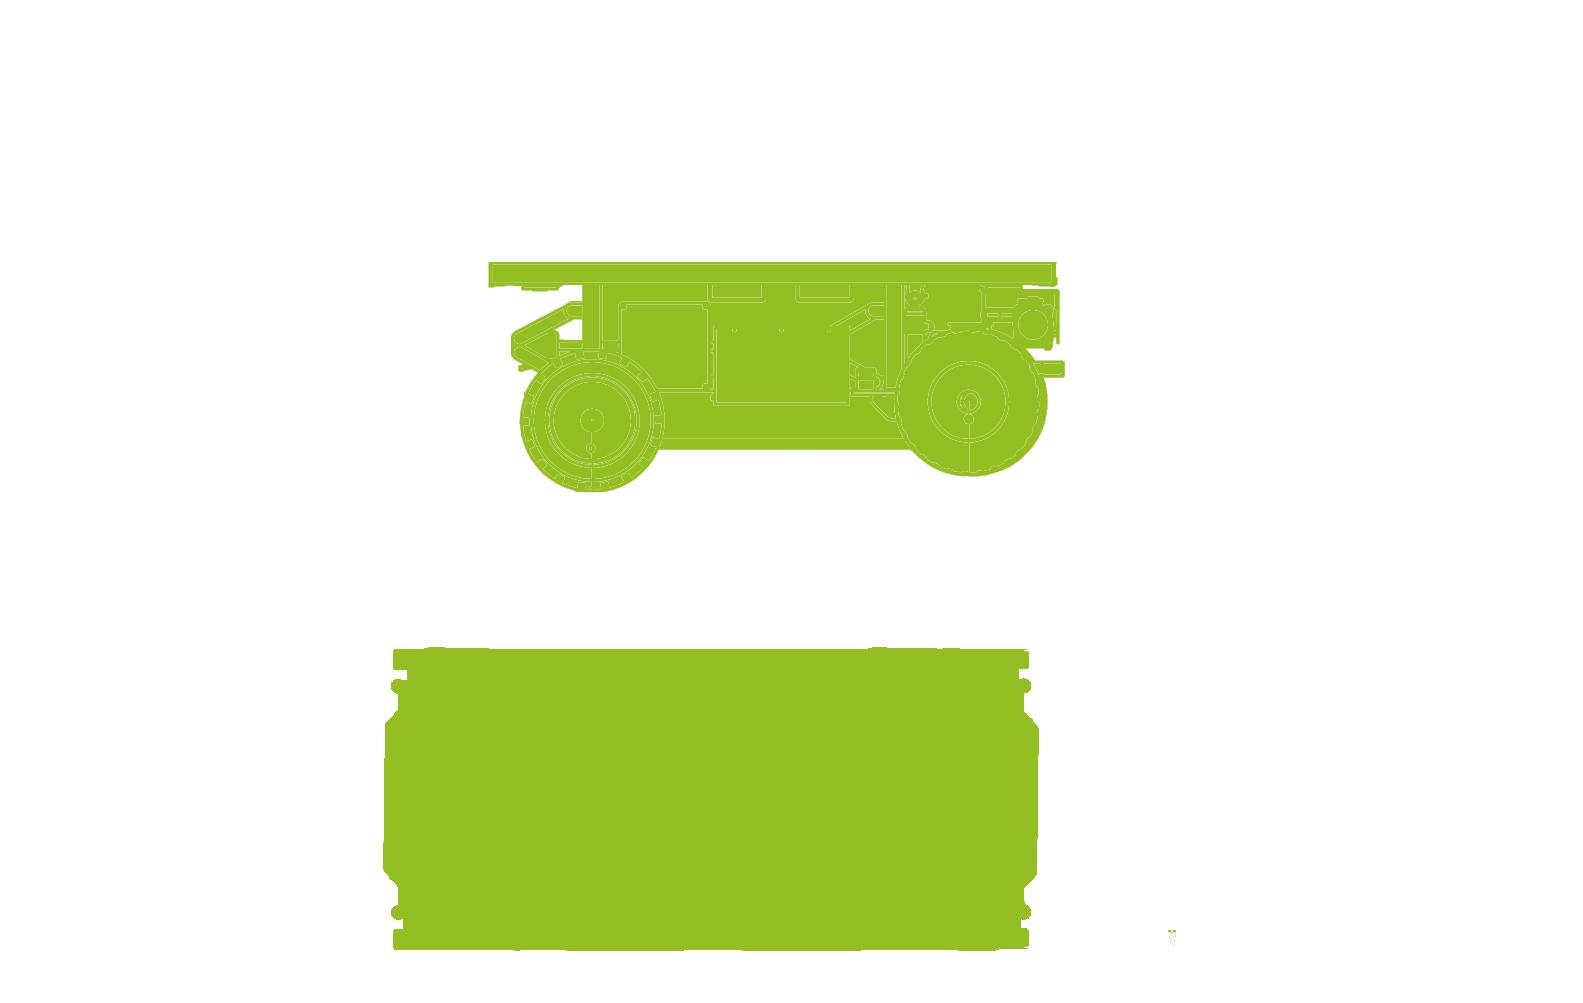 Ergomover Wireless-transport-trolley-dimensions